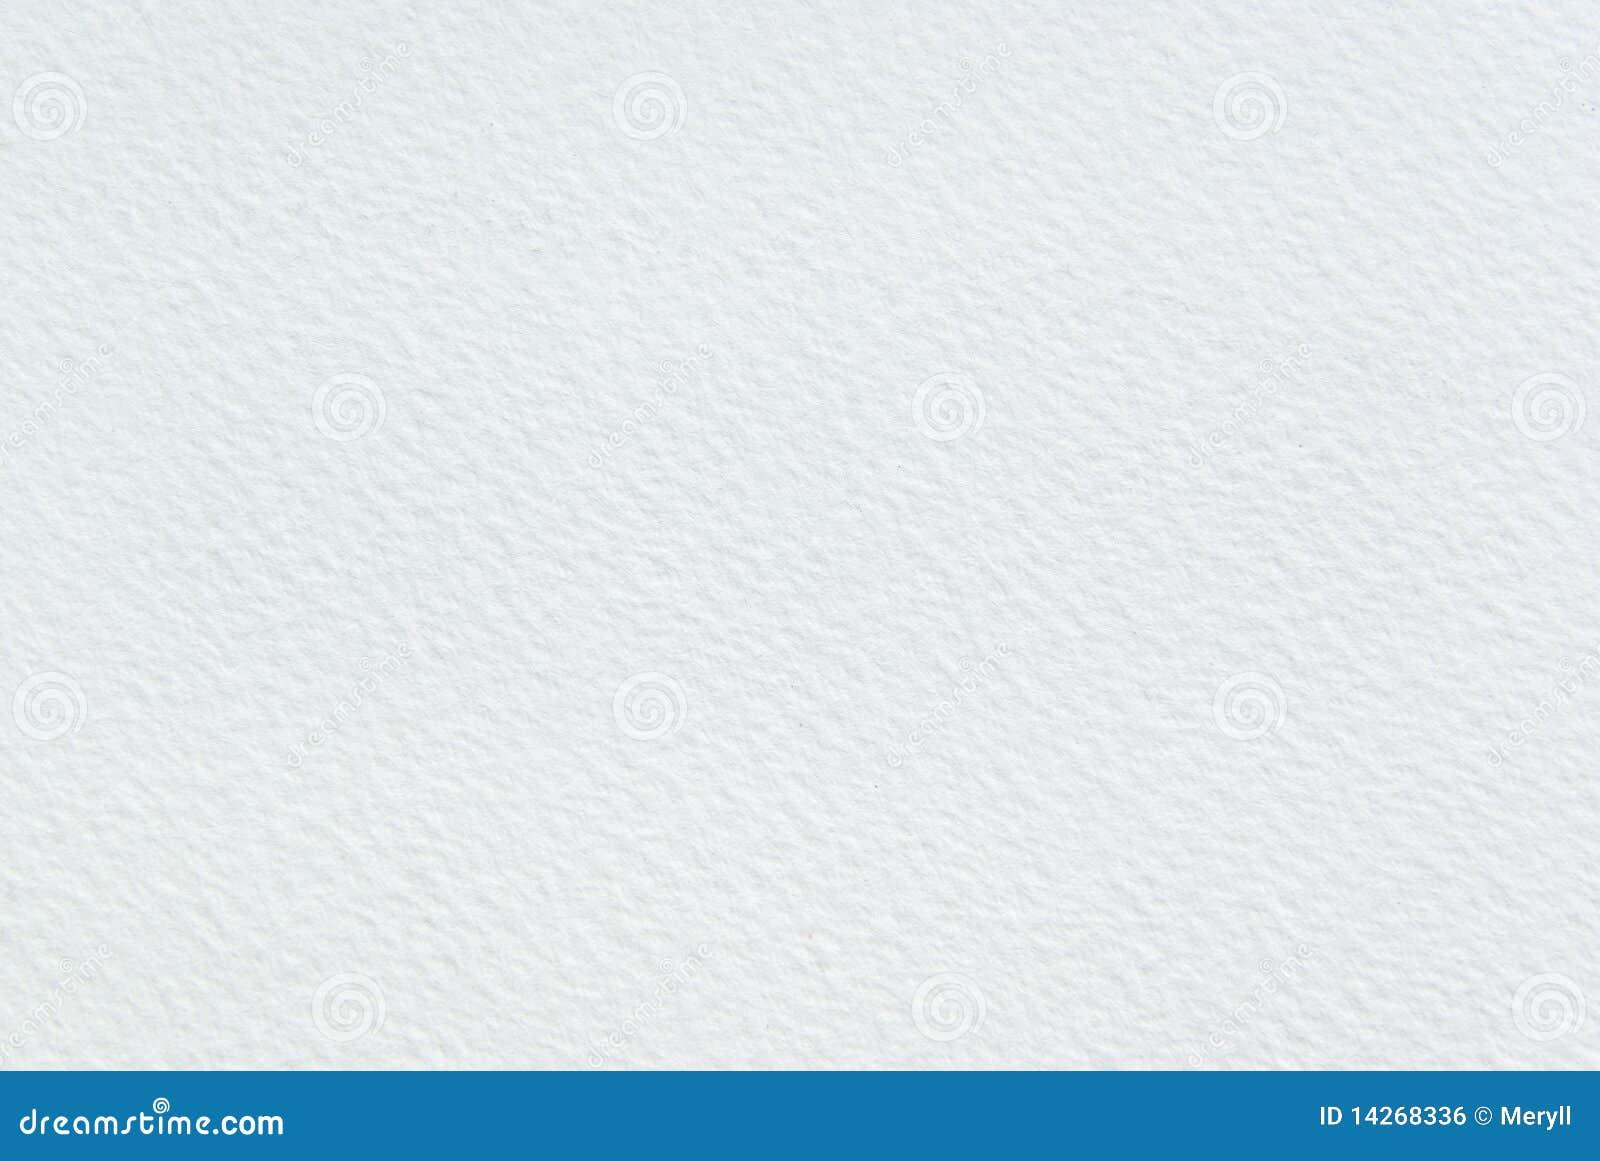 Textura do Livro Branco, fundo